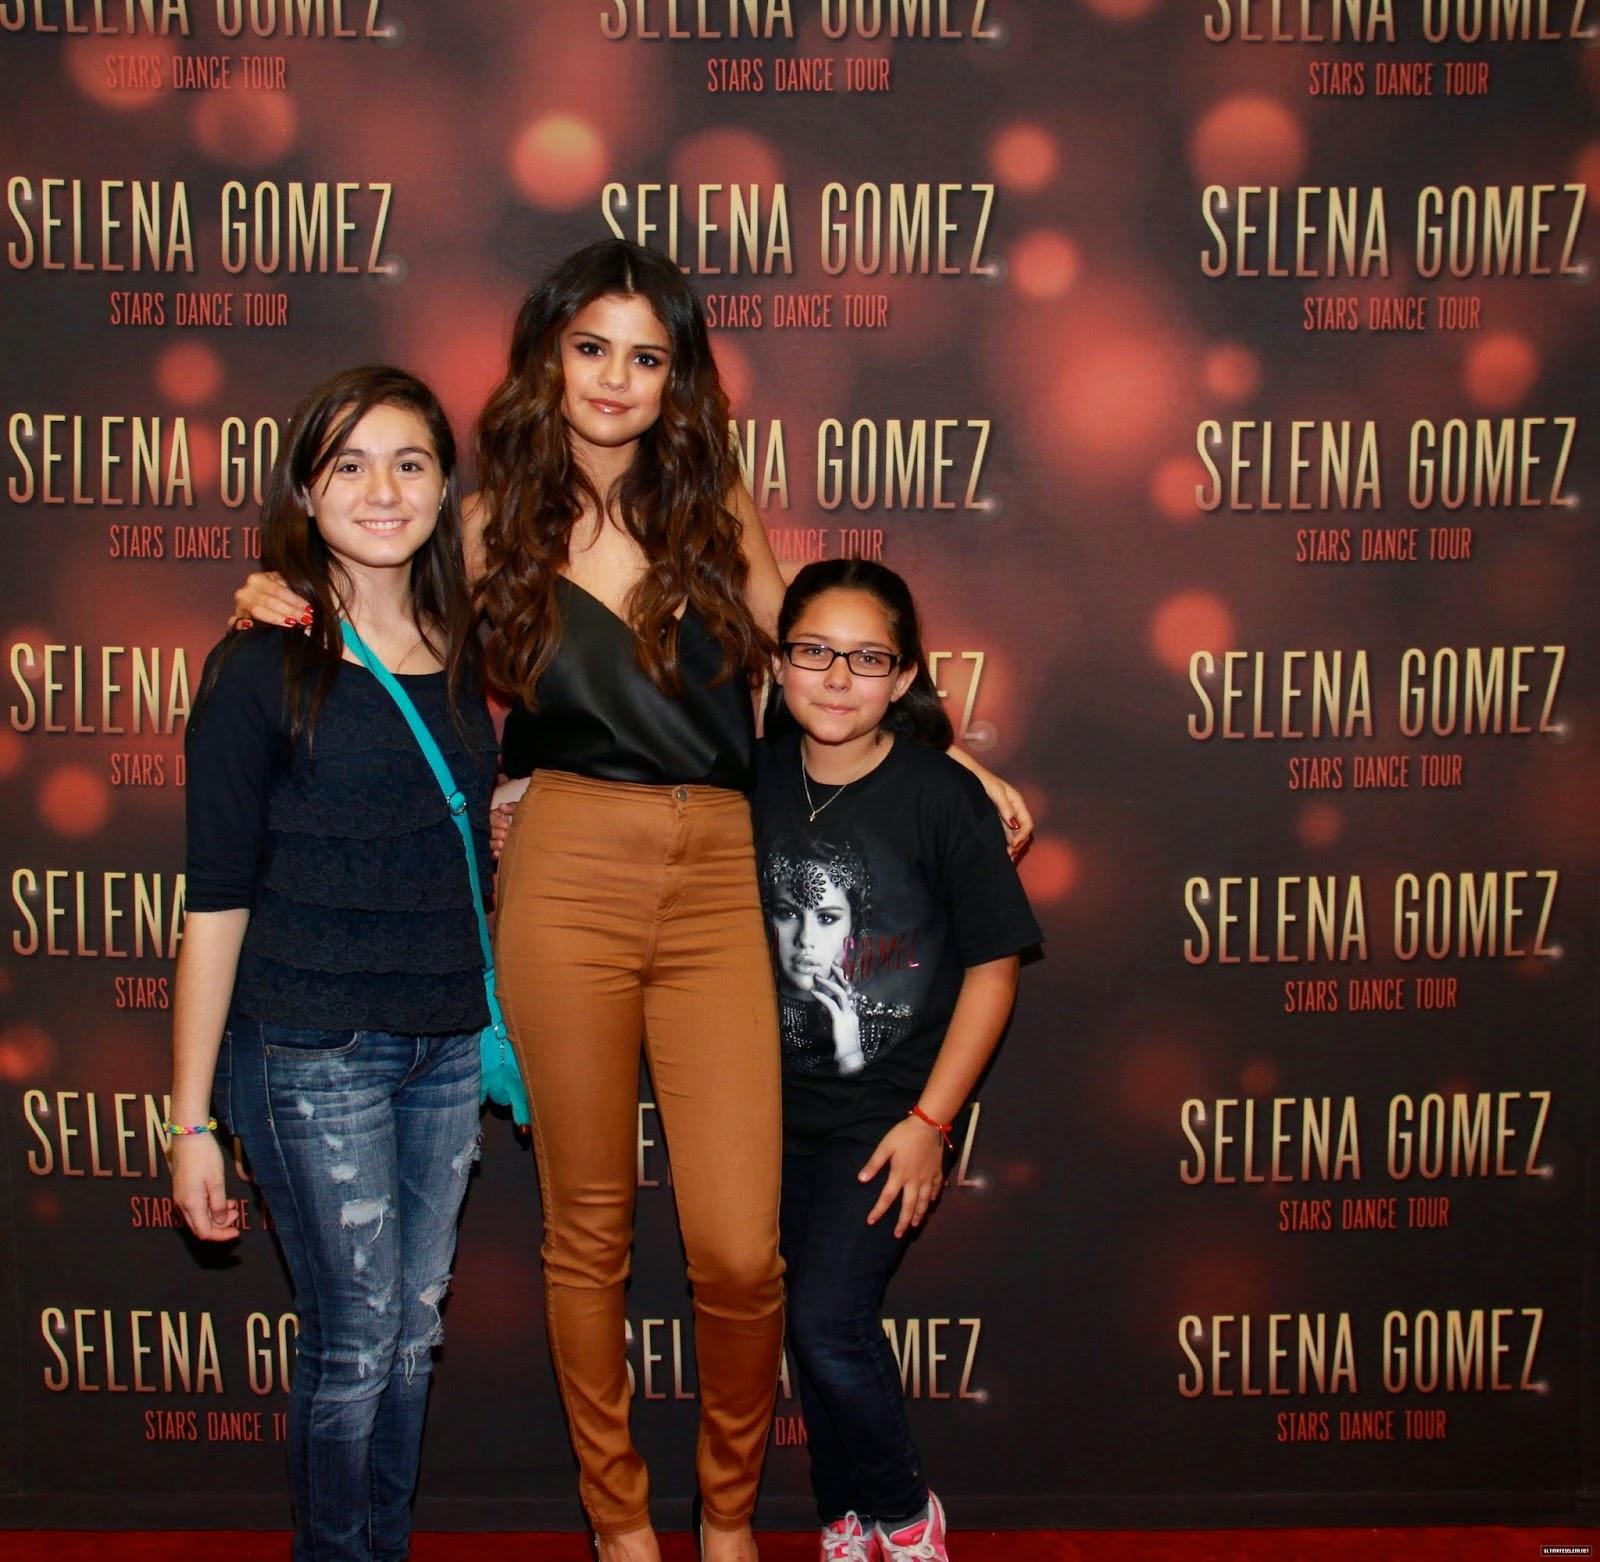 Selena gomez style stars dance world tour meet greet bordefest in selena gomez style m4hsunfo